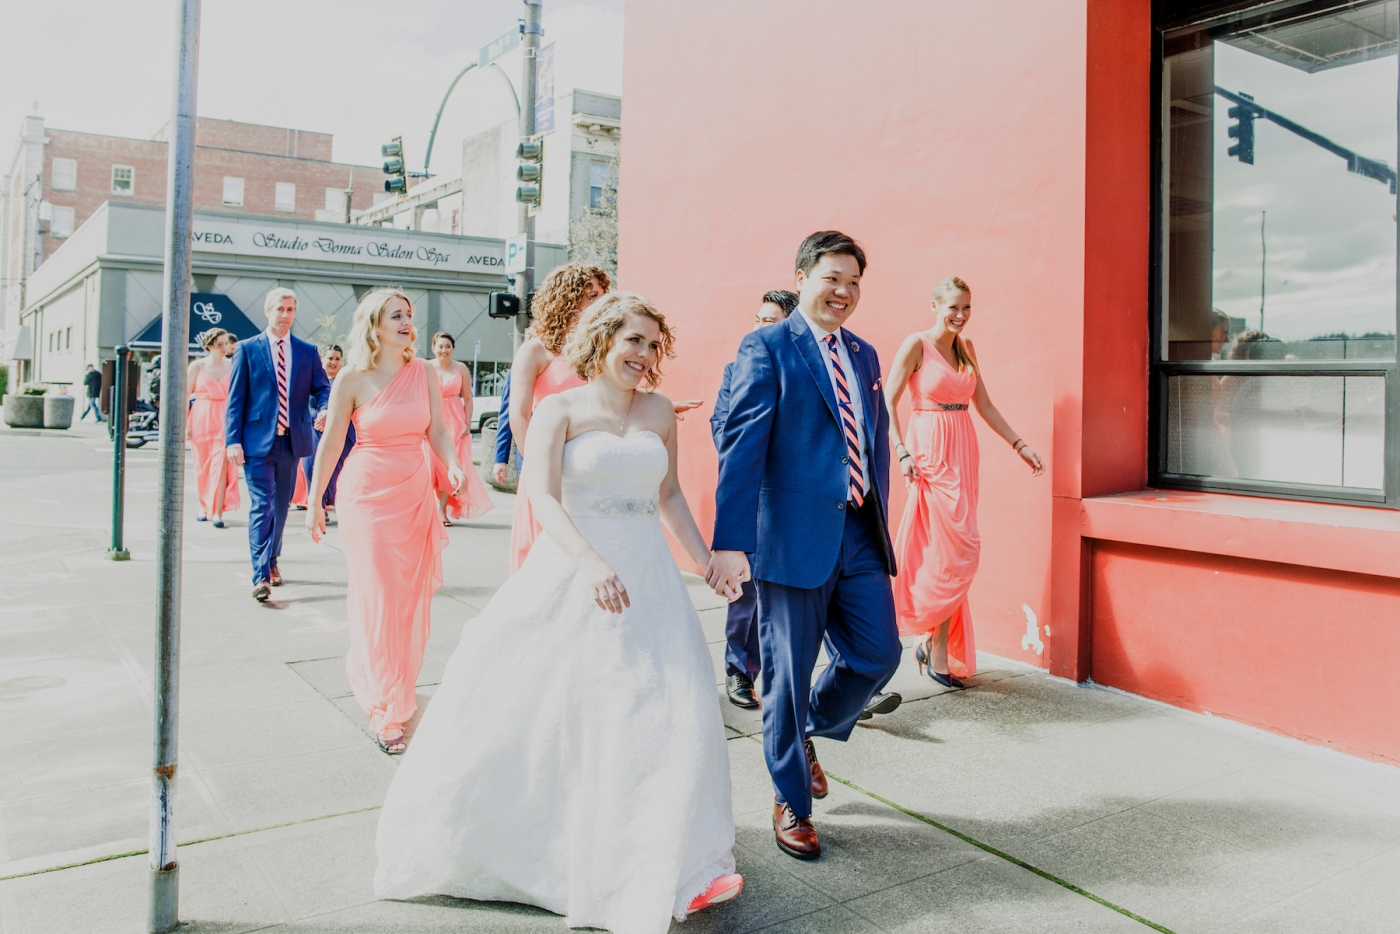 DSC_2166Everett_Wedding_Ballroom_Jane_Speleers_photography_Rachel_and_Edmund_Bridesmaids_peach_dresses_groomsmen_2017